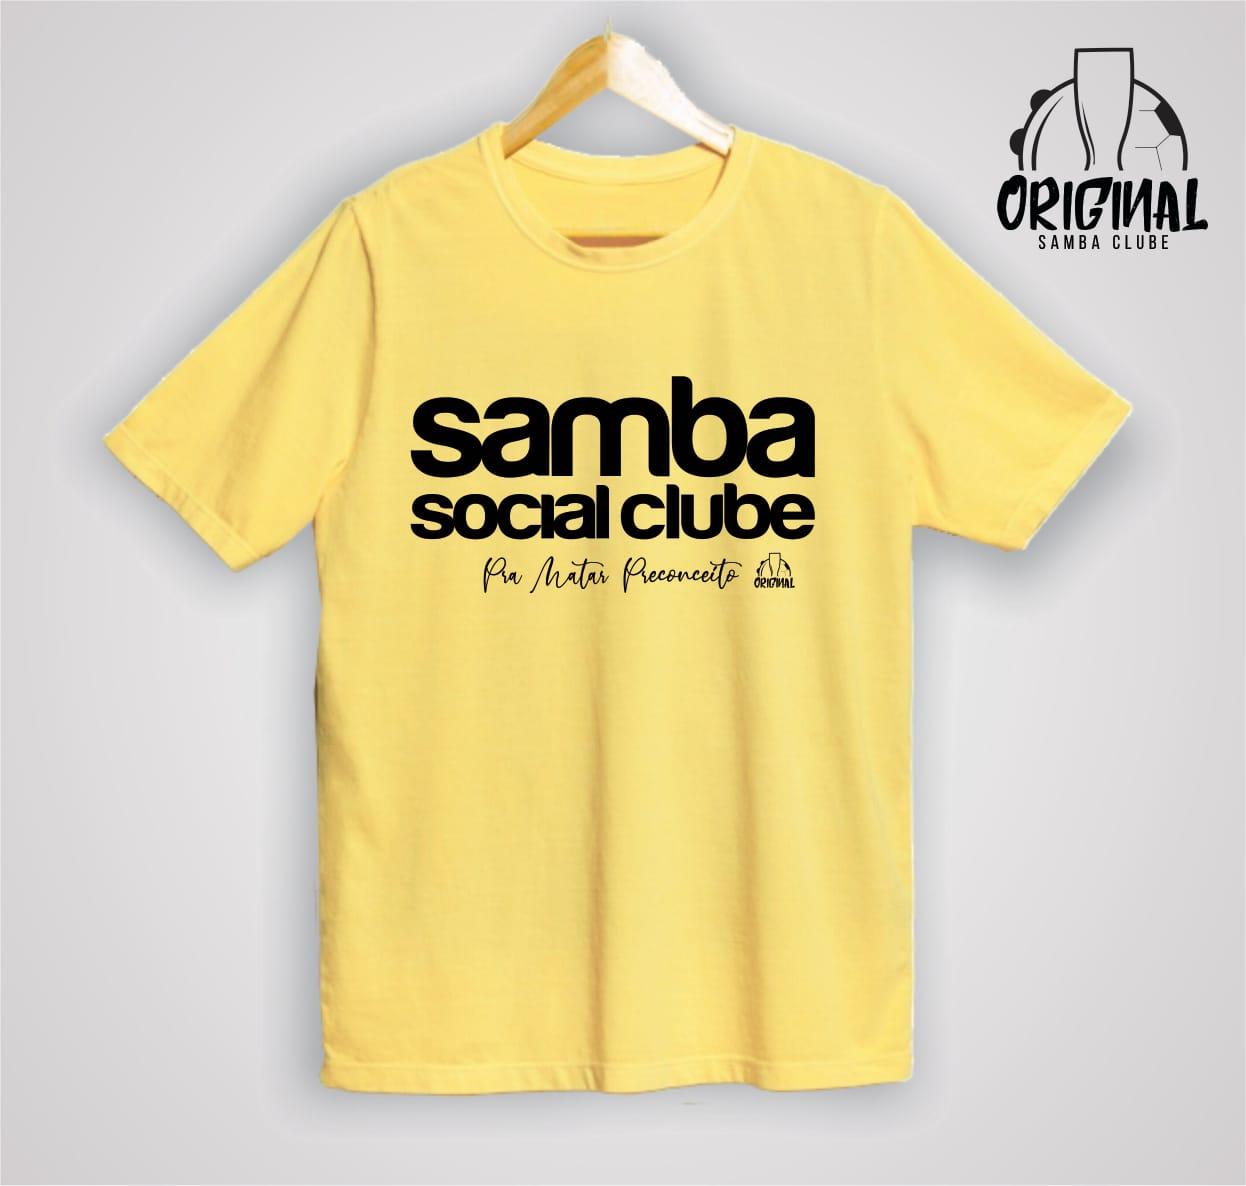 Camisa Pra Matar Preconceito - Samba Social Clube